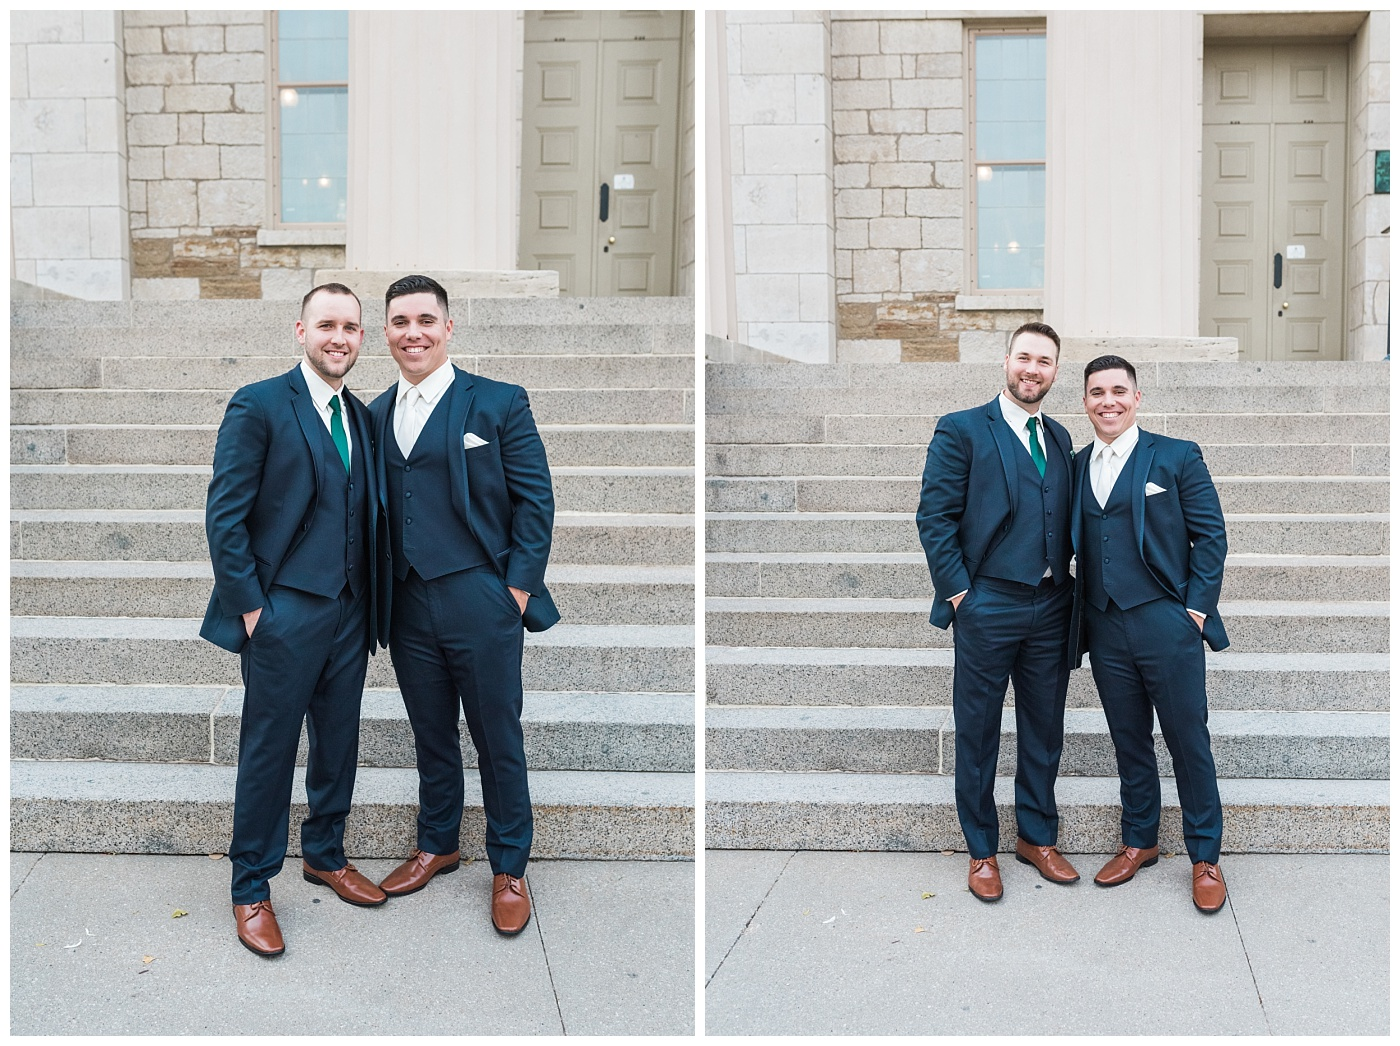 Stephanie Marie Photography Unitarian Universalist Society Church Ceremony Hotel Kirkwood Reception Cedar Rapids Iowa City Wedding Photographer Sean Madison Moore_0057.jpg